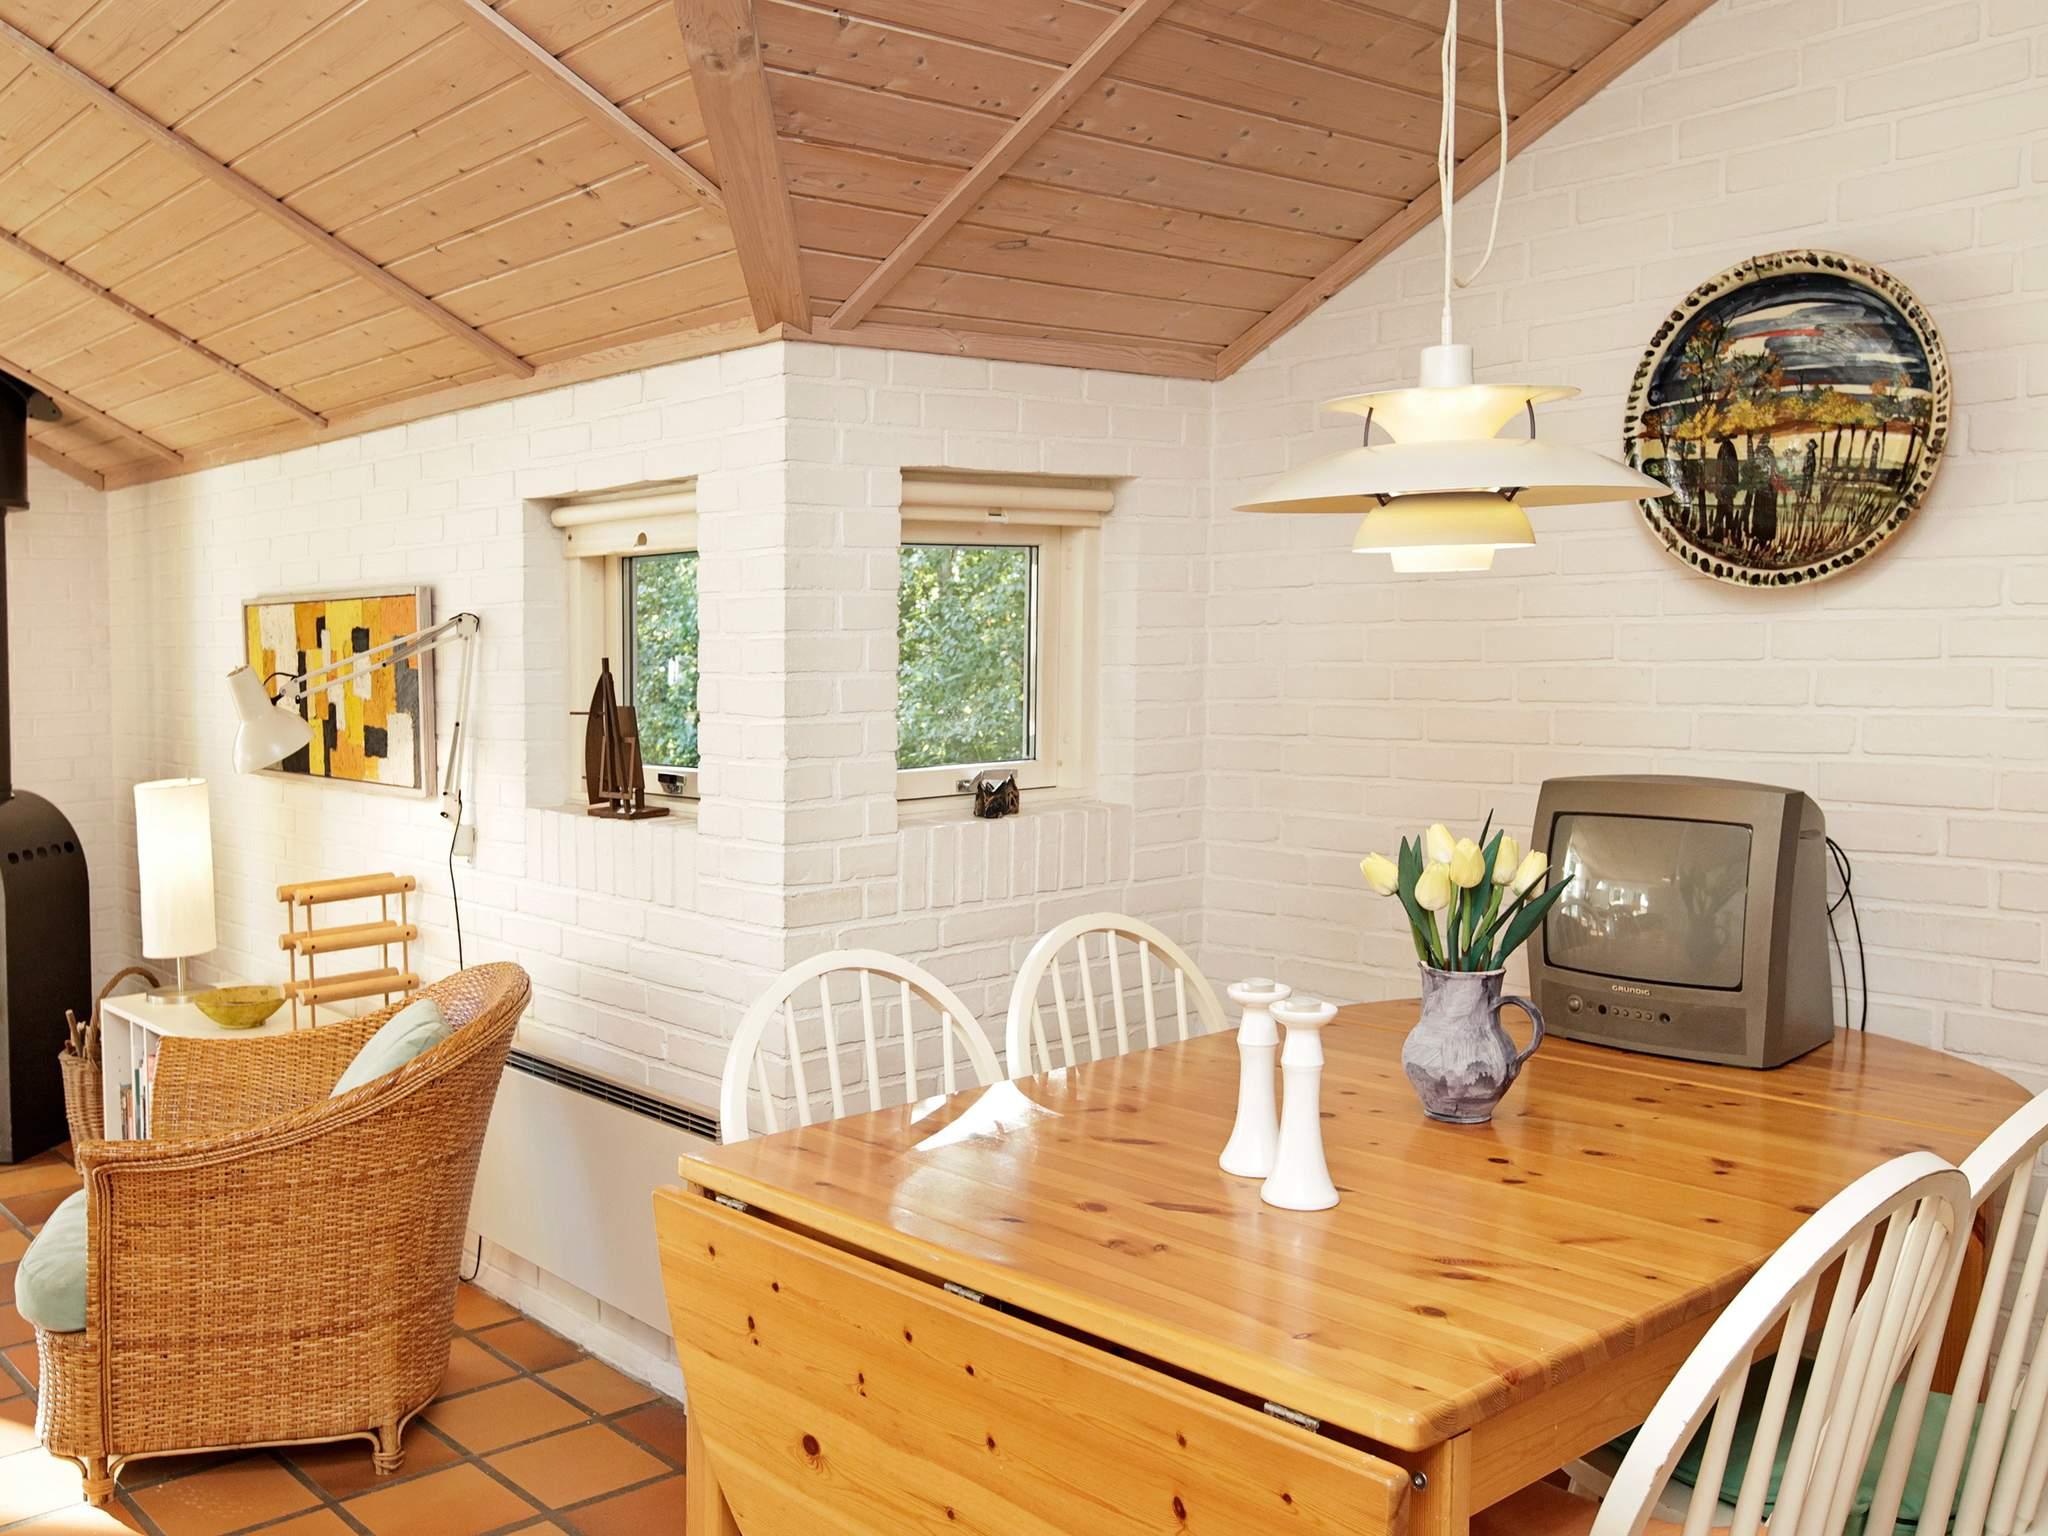 Ferienhaus Ristinge (160040), Ristinge, , Langeland, Dänemark, Bild 7